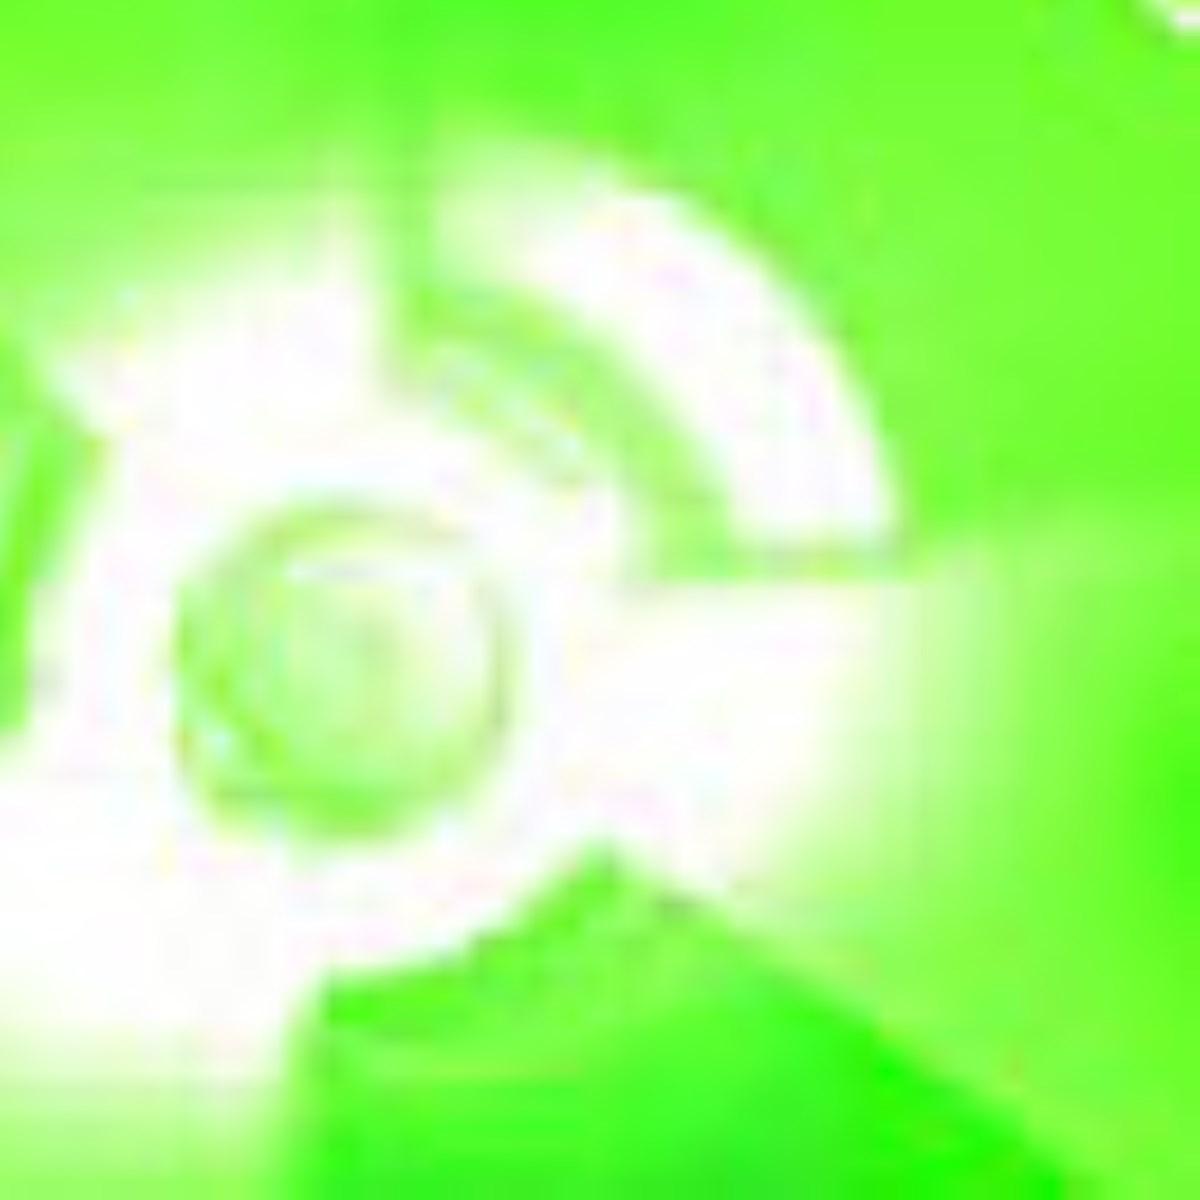 انرژی هسته ای : چالش ها و مزیت ها